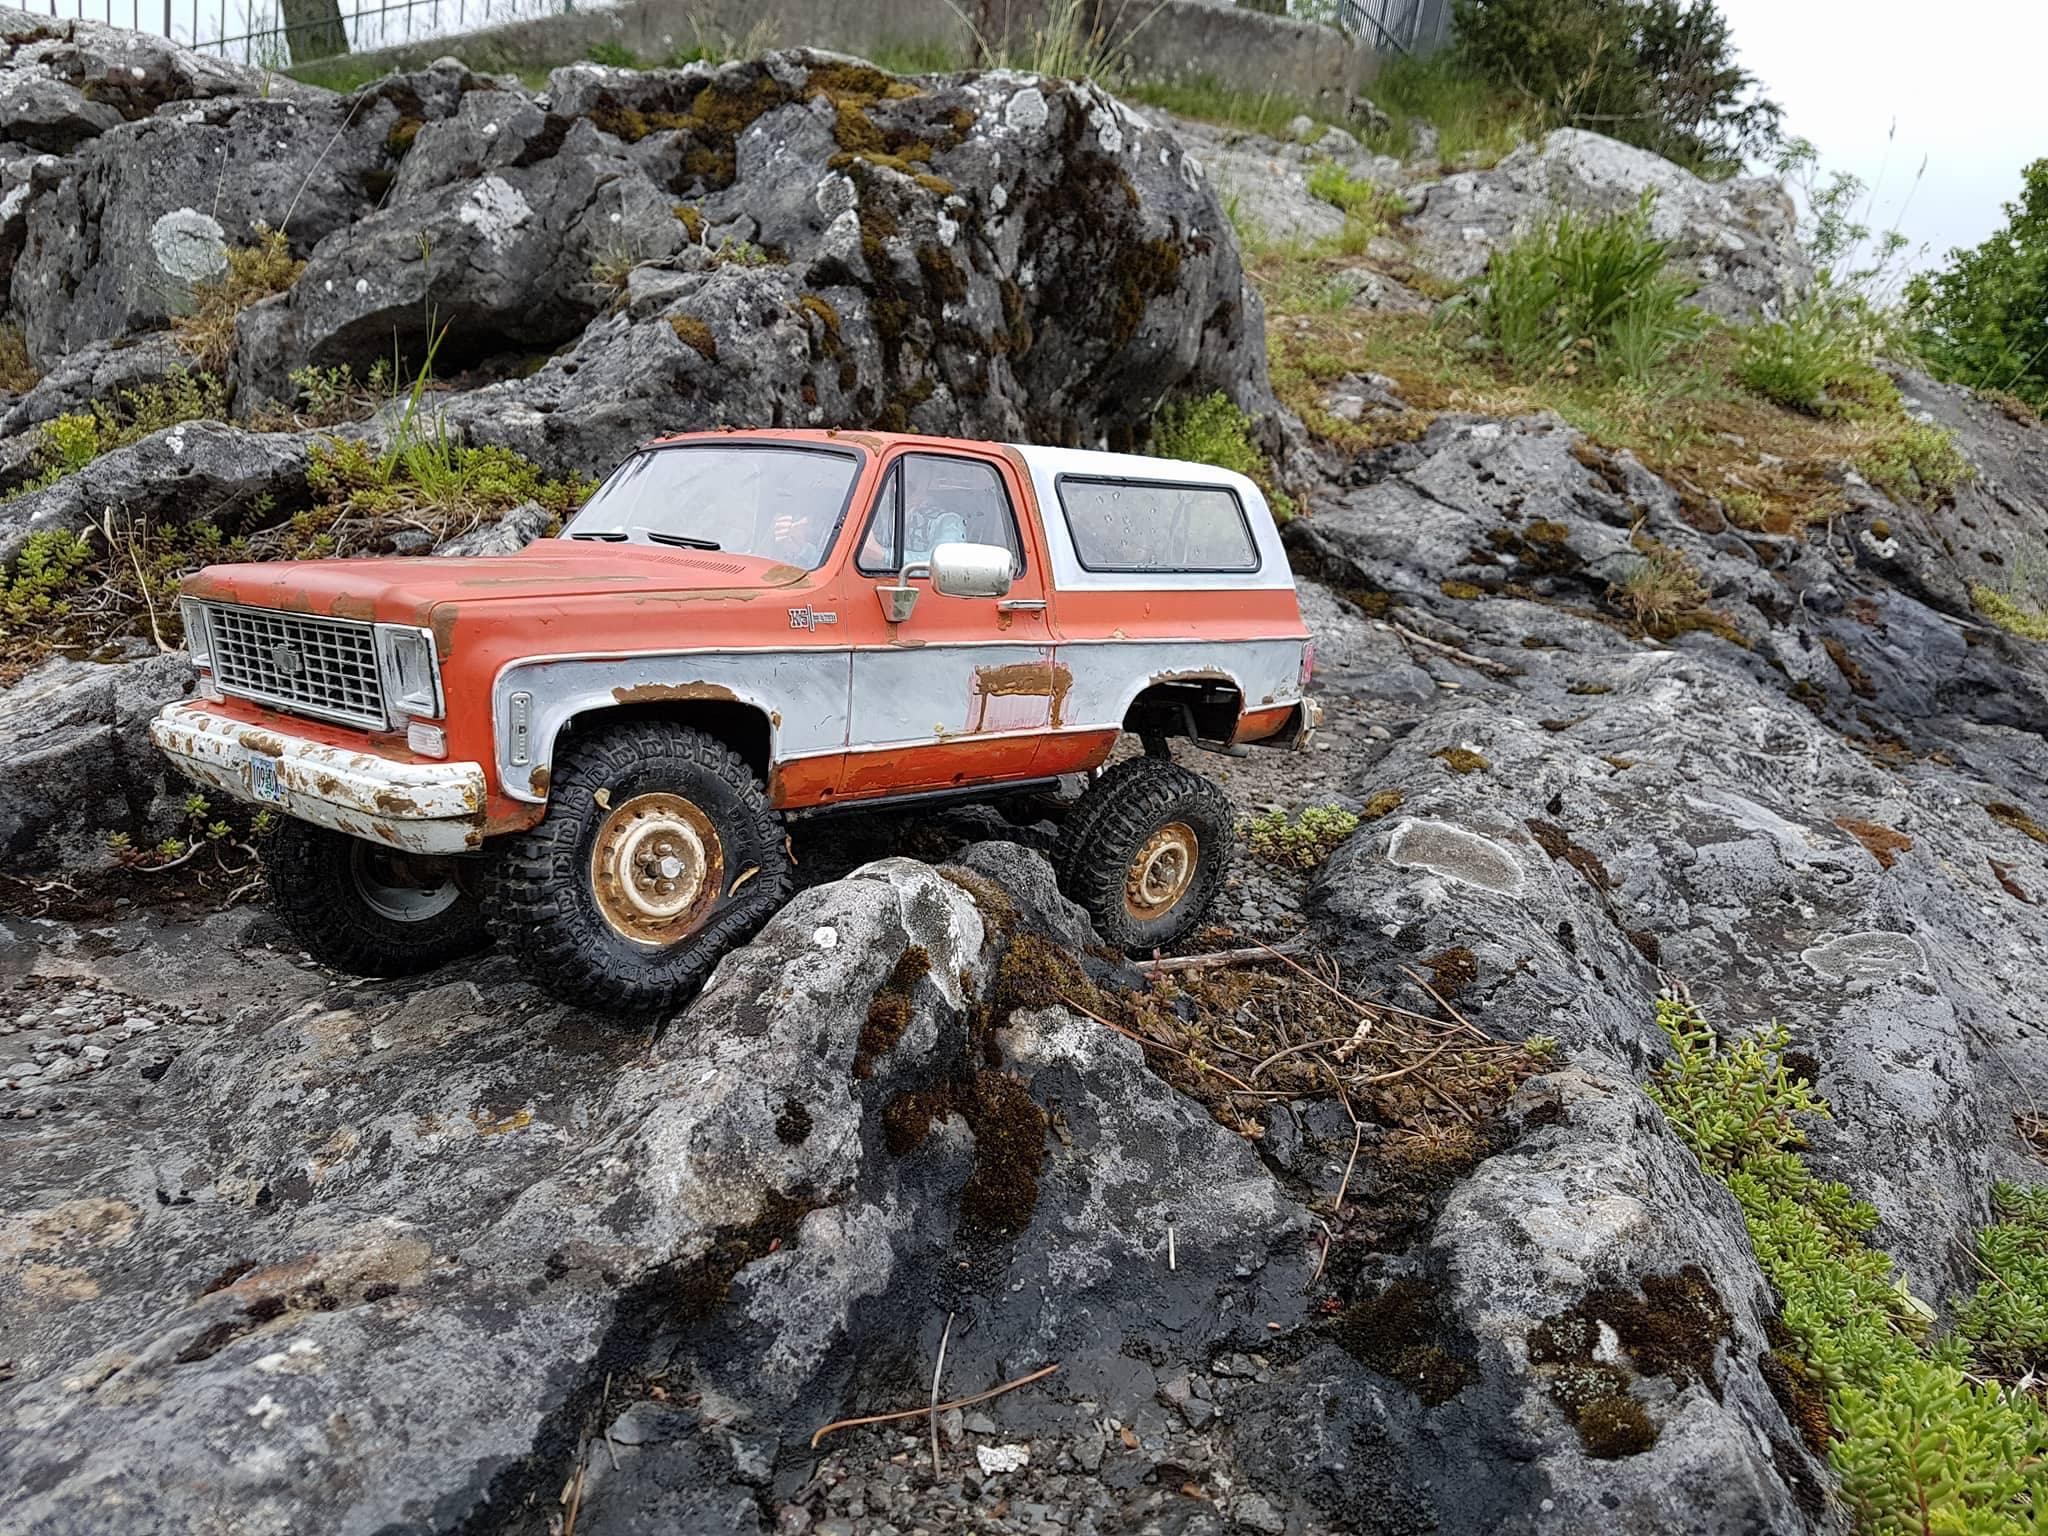 Farm Truck Chevrolet Blazer K5 sur TF2, Road Trip ! - Page 2 432847189470011288511901267350414683444o